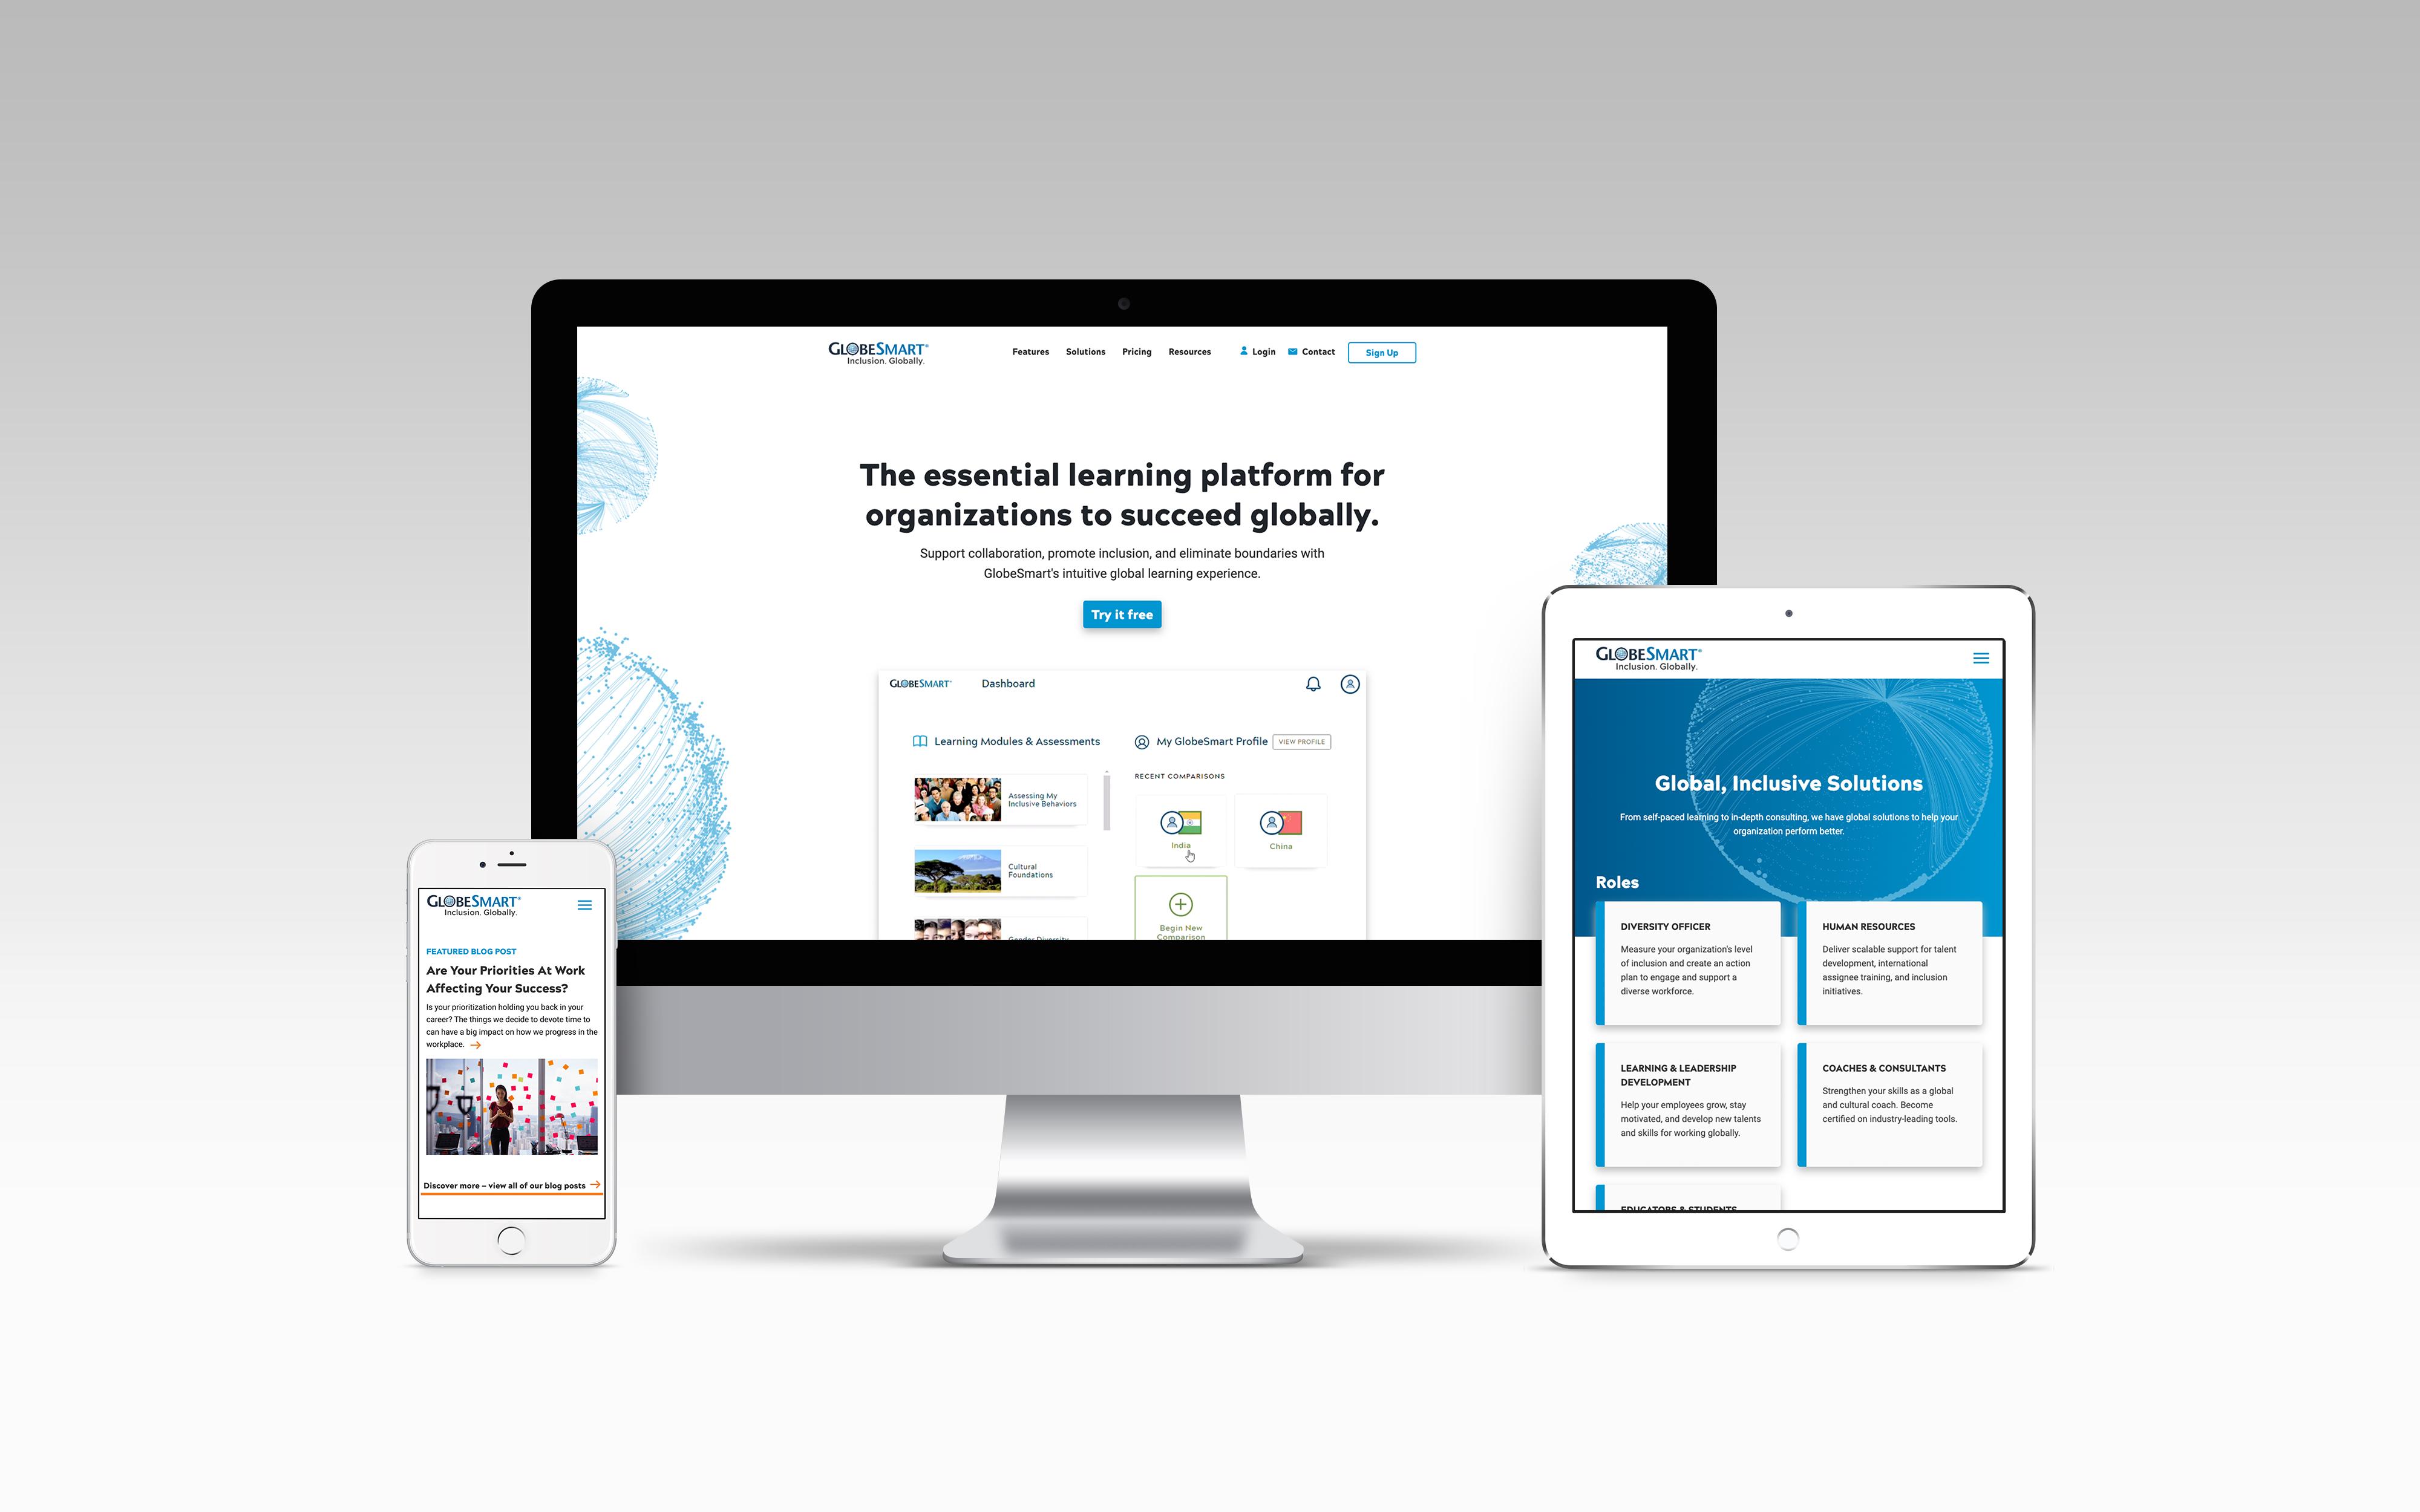 GlobeSmart Website Redesign